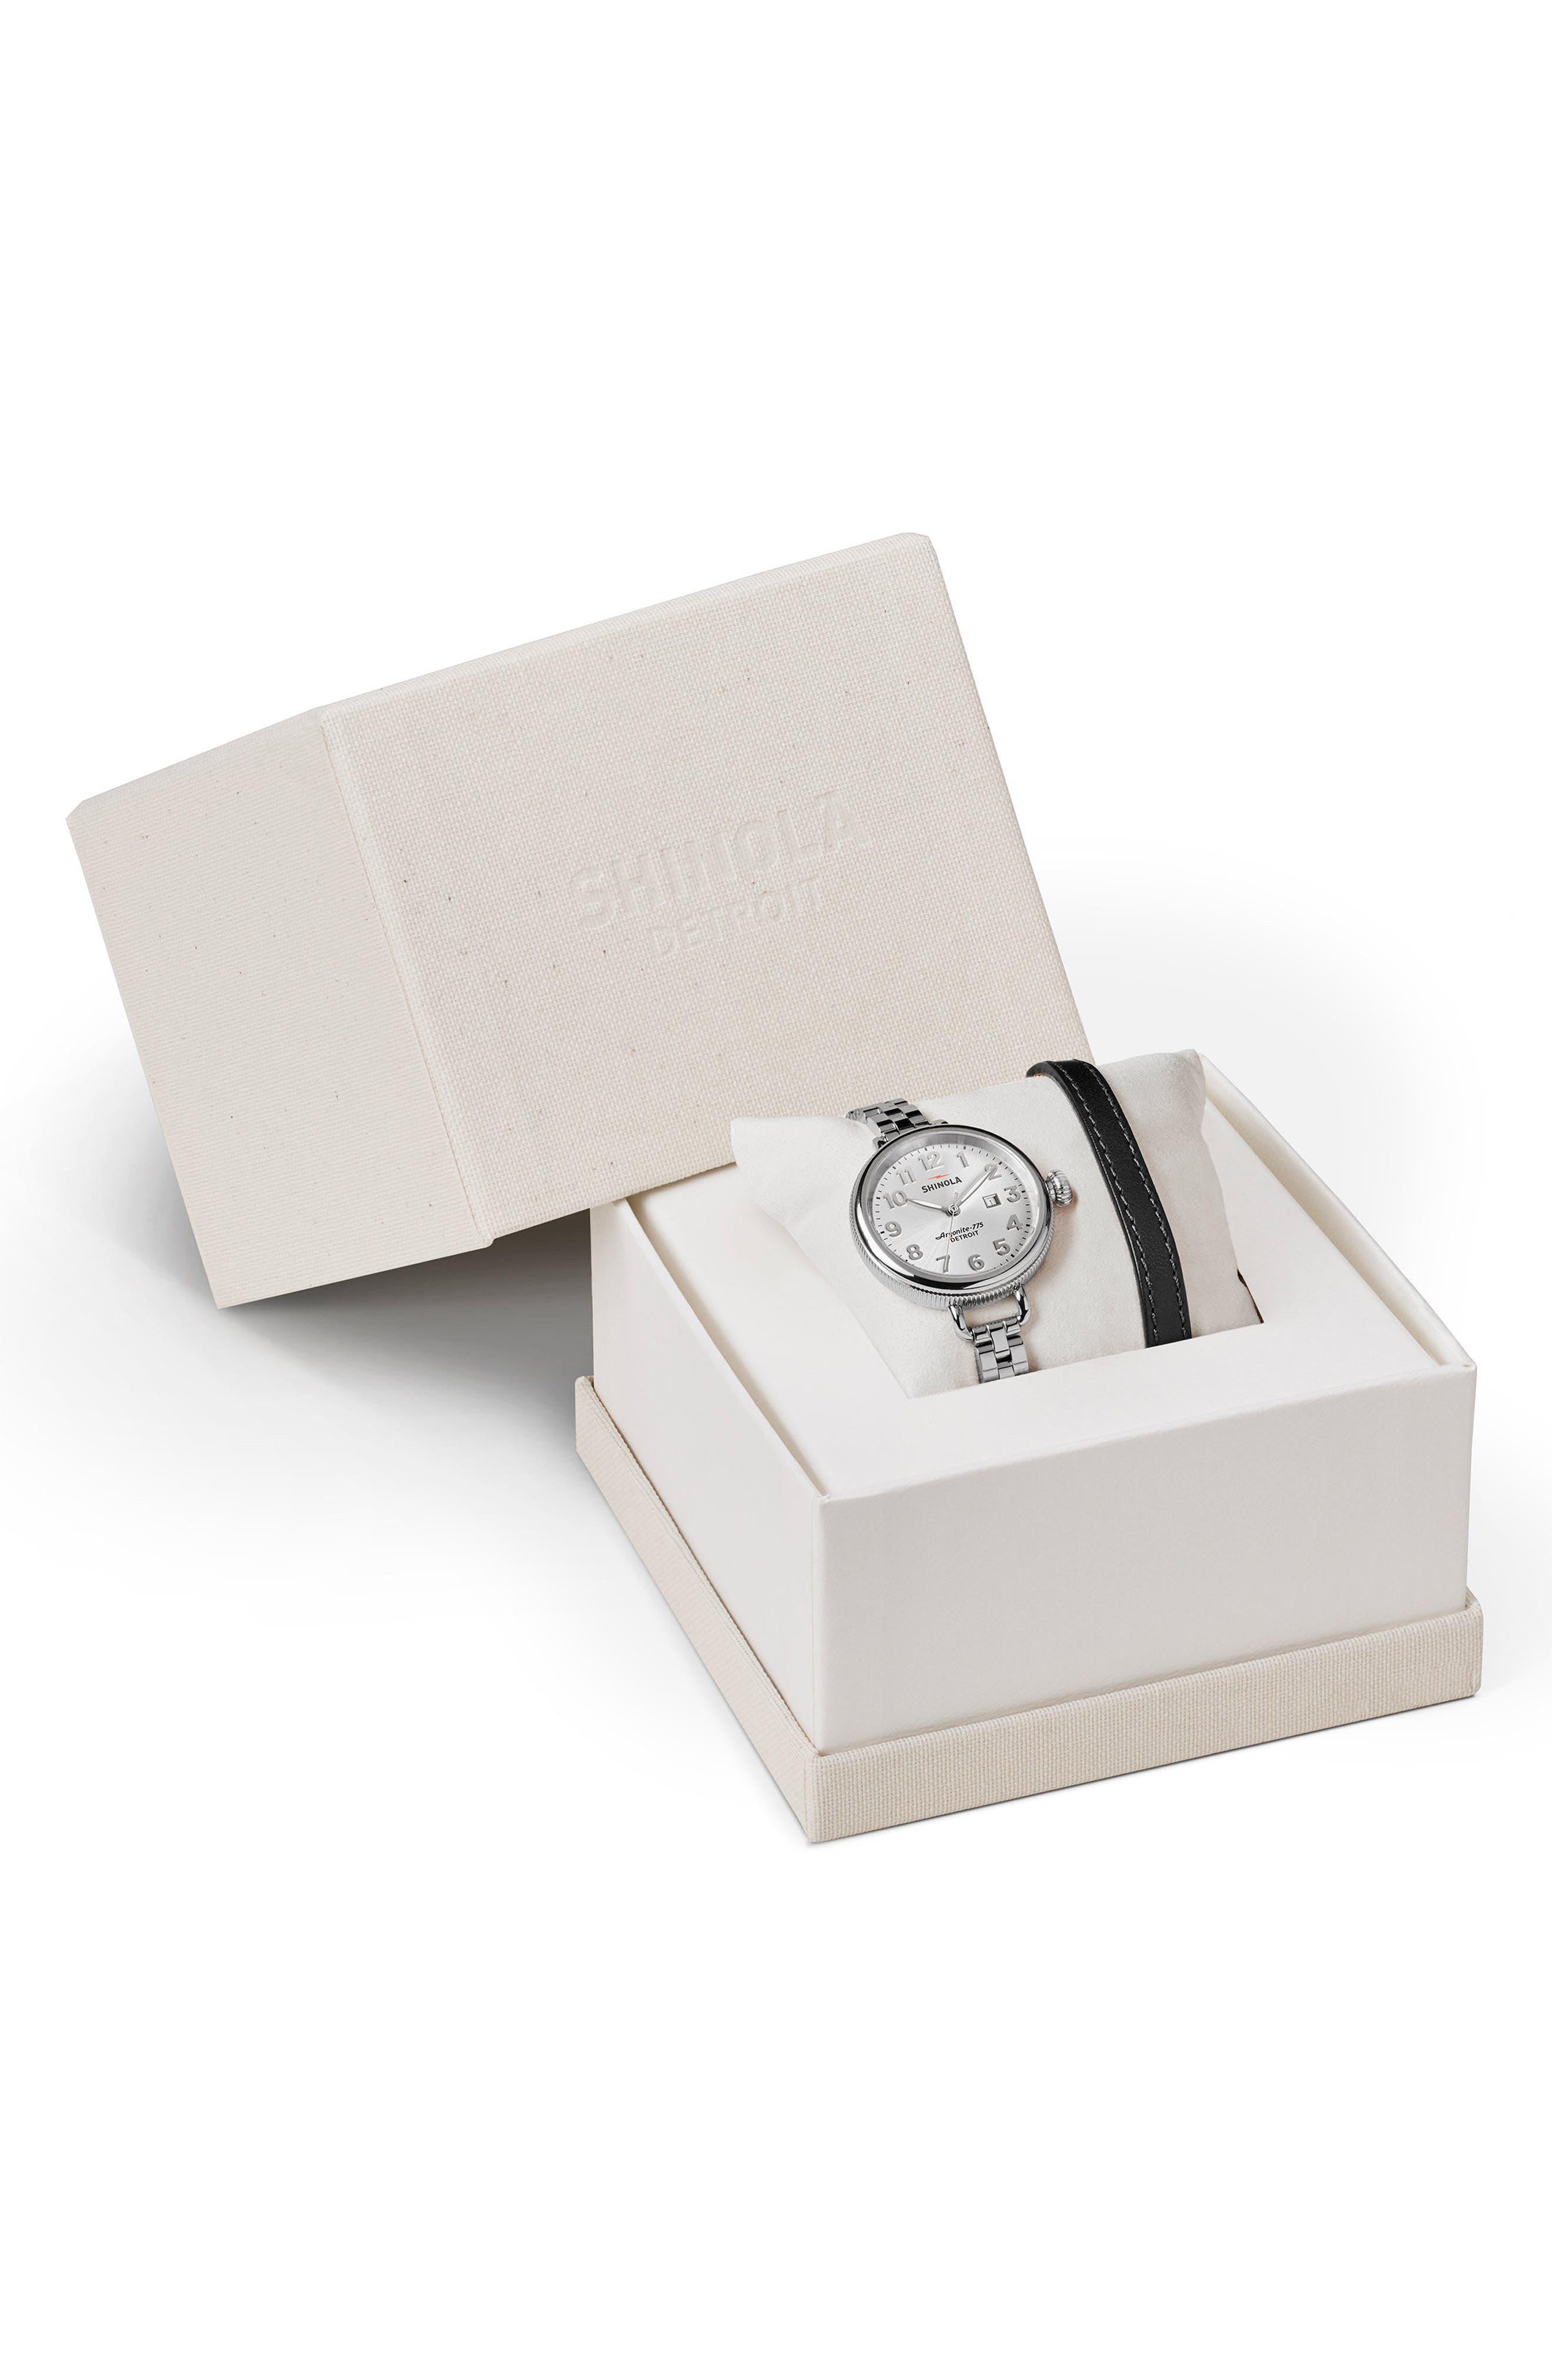 Main Image - Shinola The Birdy Watch Gift Set, 34mm